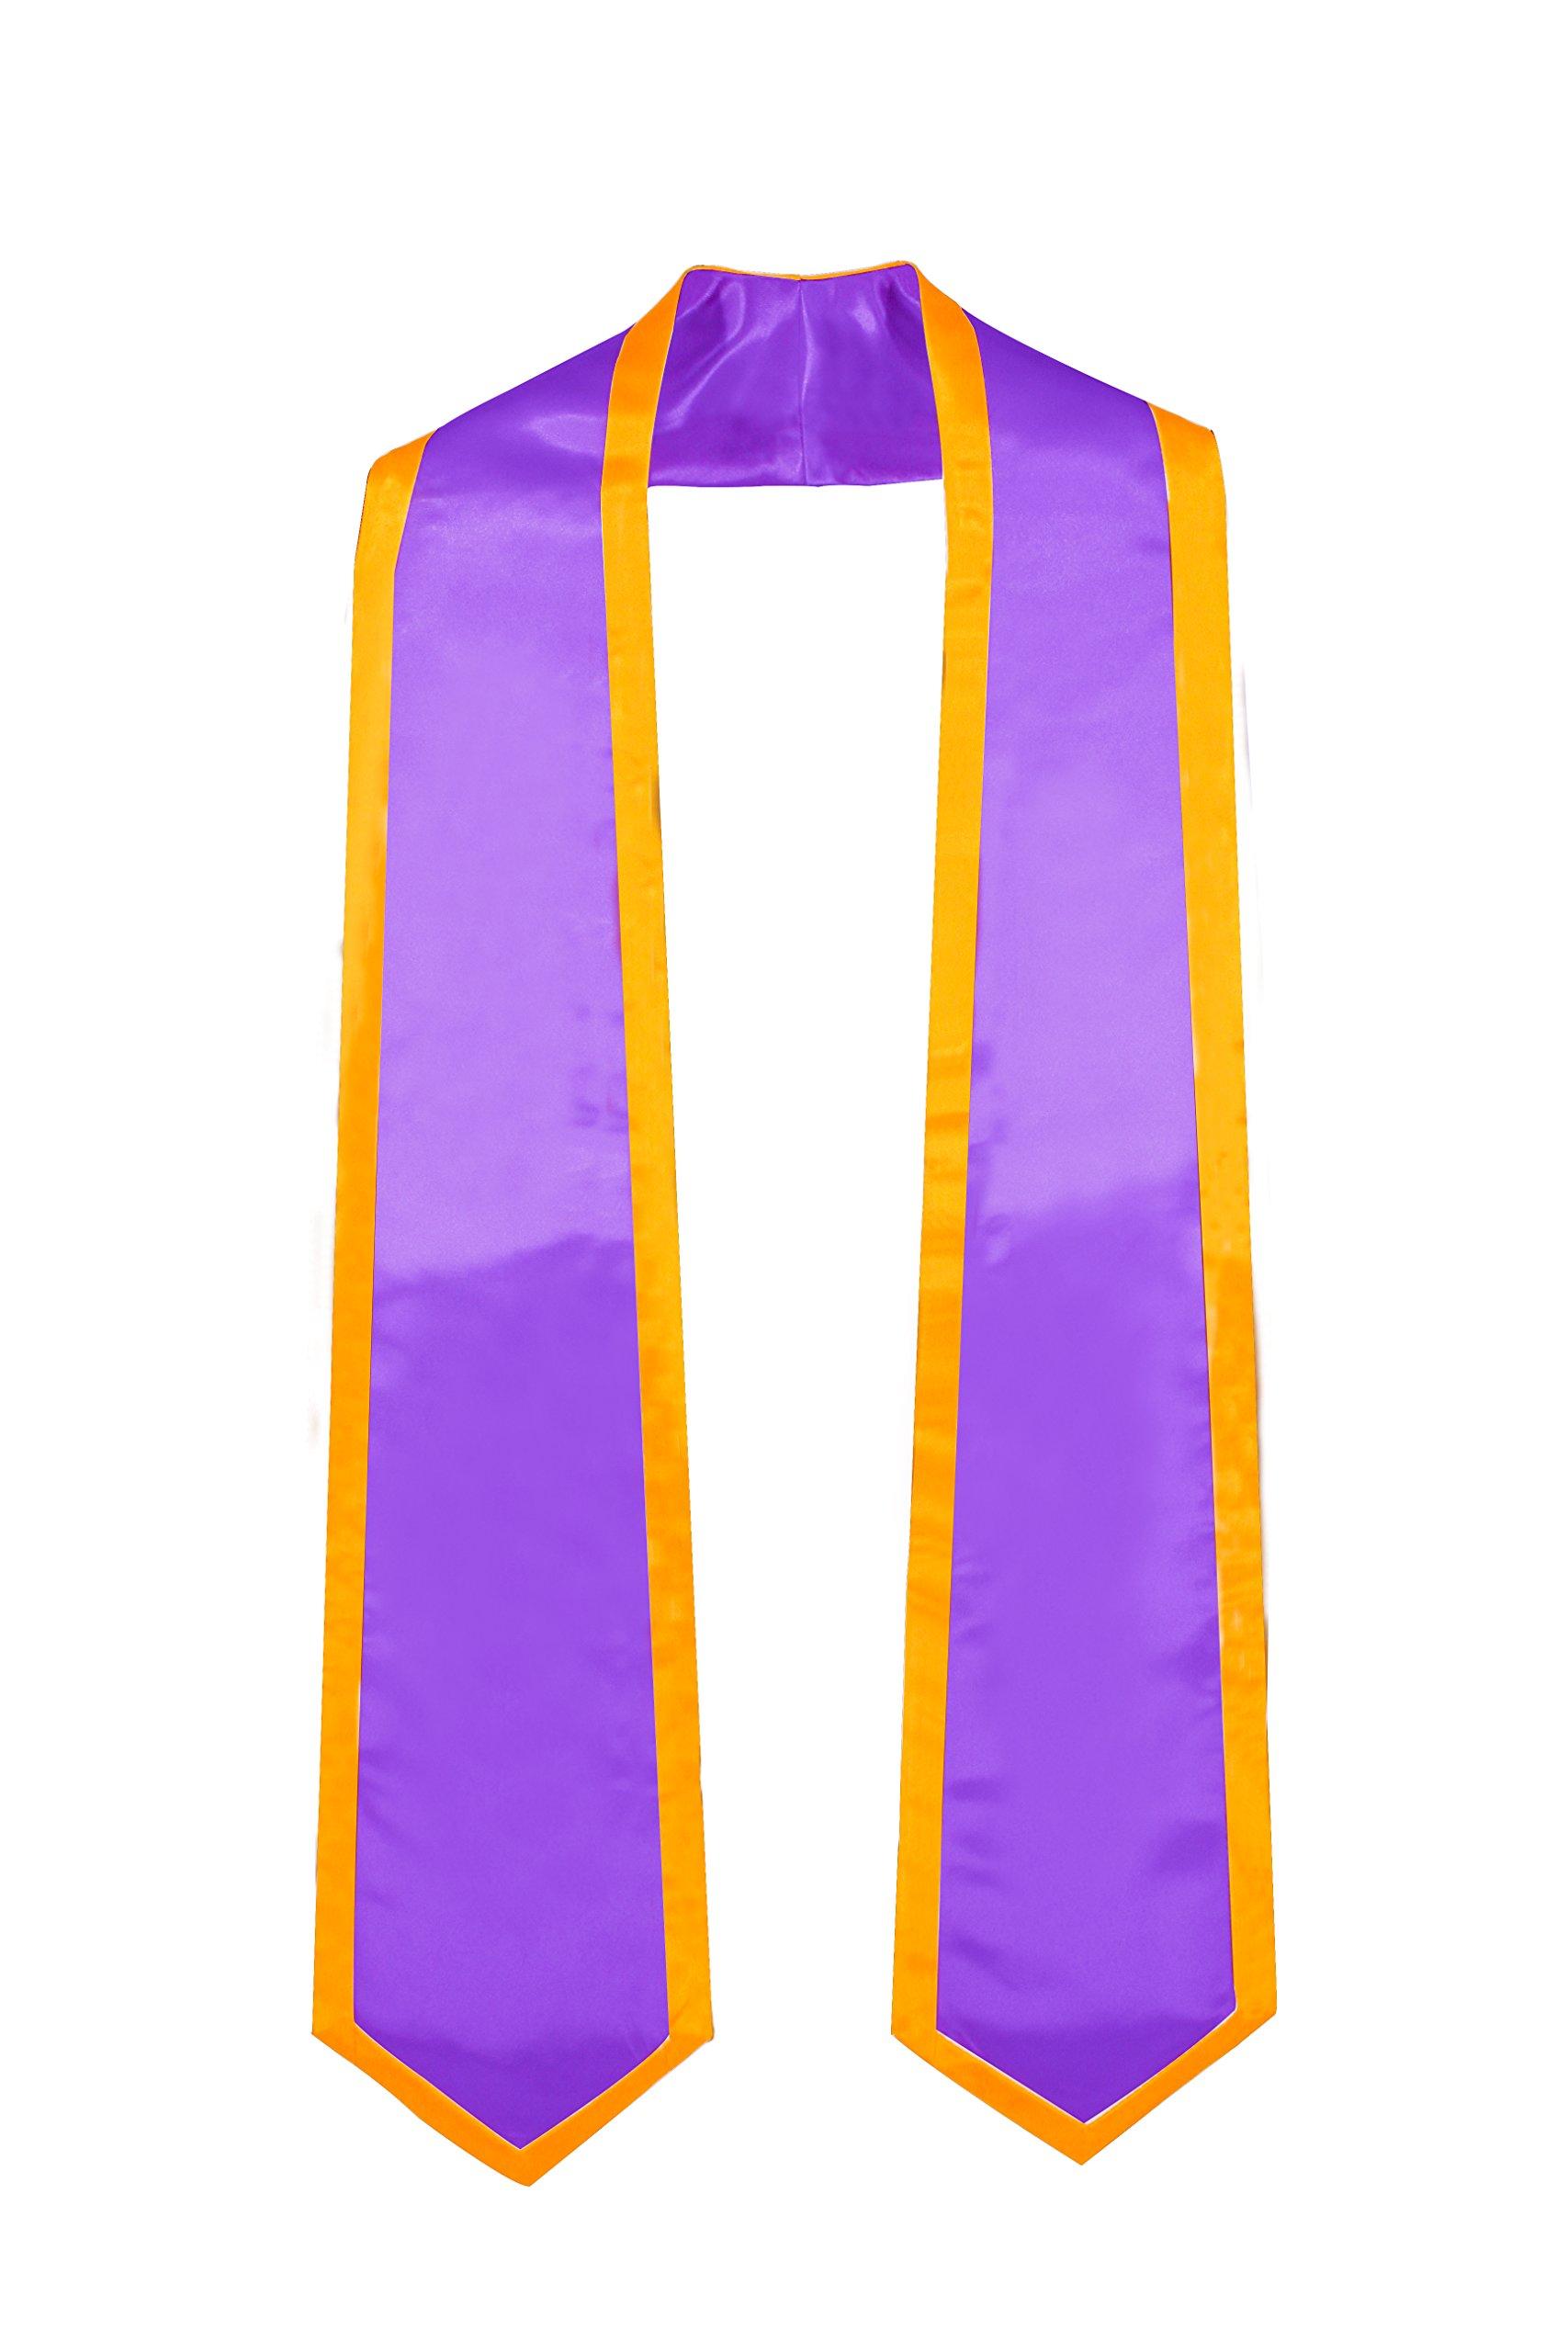 Sigma Lambda Beta Kente Graduation Stole Hand Made in Ghana 100 percent Rayon Purple